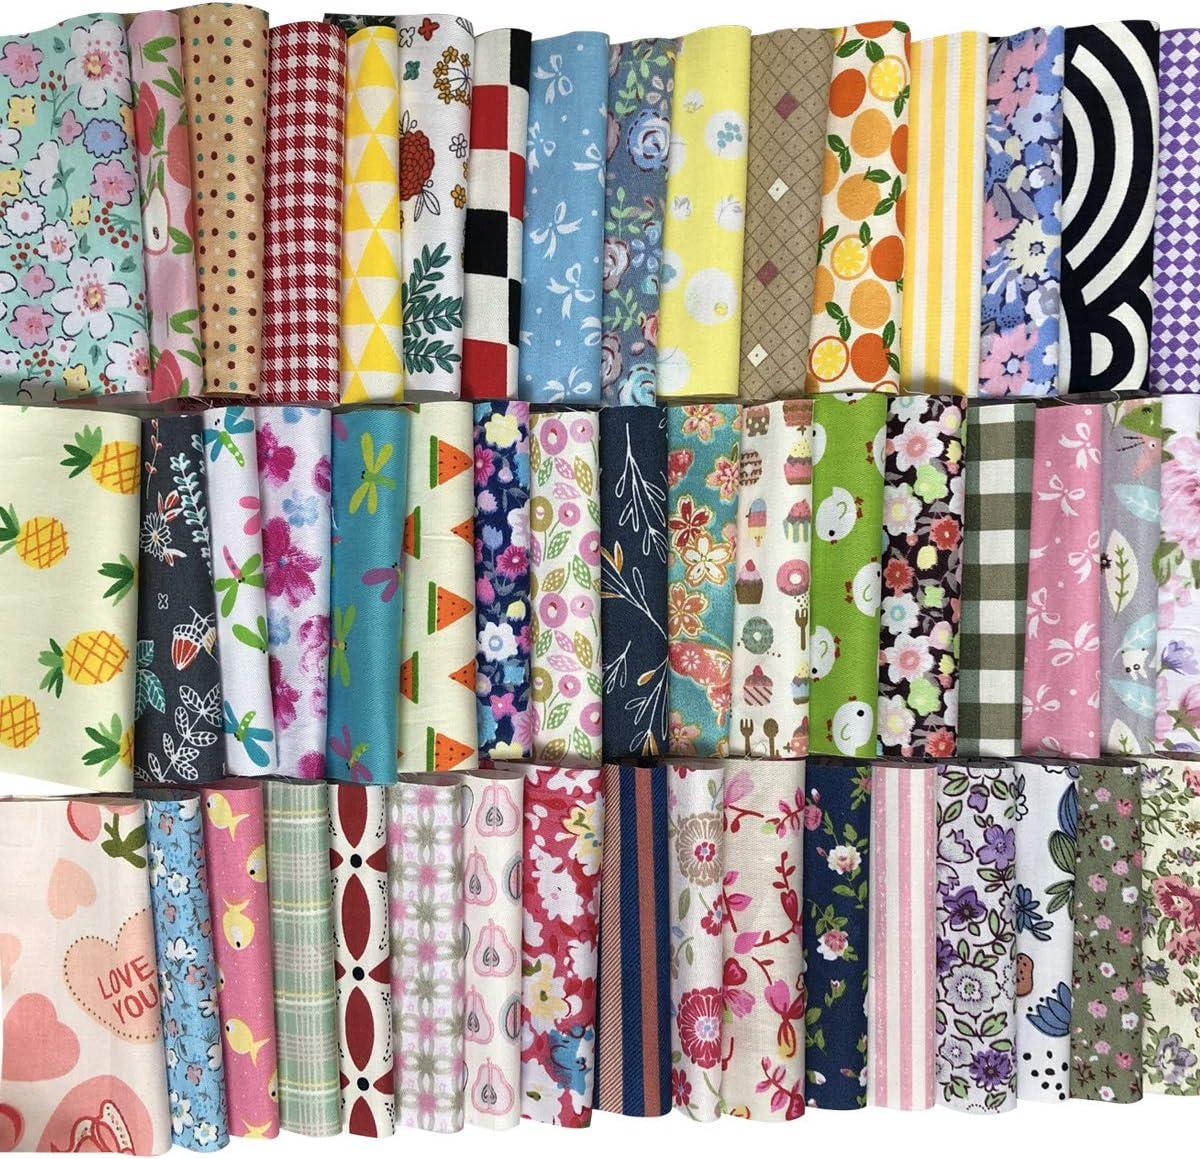 Misscrafts Cotton Fabric Squares Precut Quilting Charm Pack